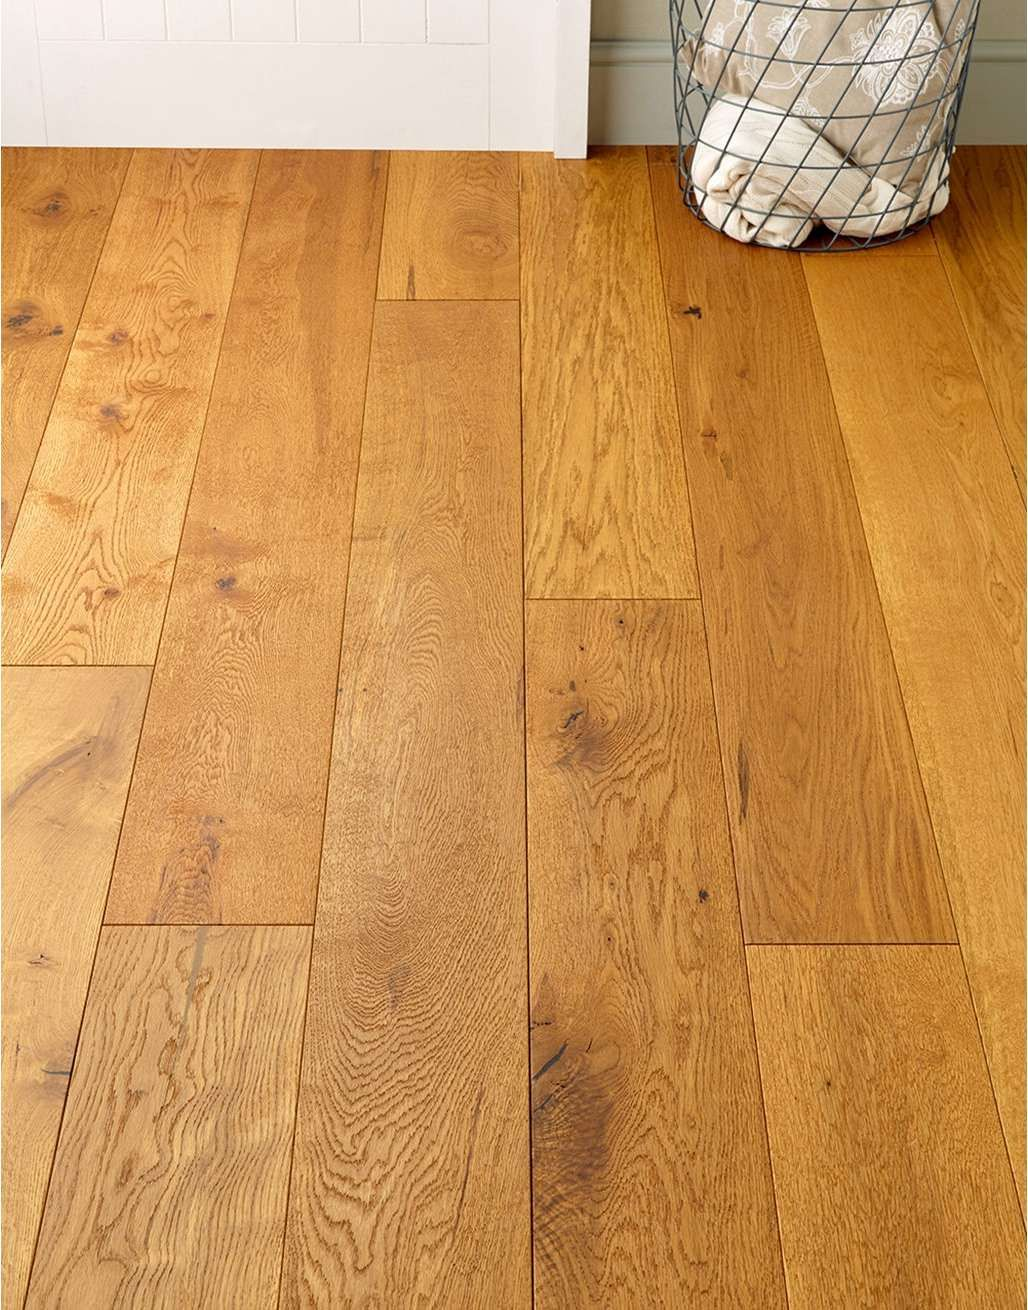 Old Country Antique Golden Oak Brushed Oiled Engineered Wood Flooring Engineered Wood Floors Engineered Wood Wood Floors